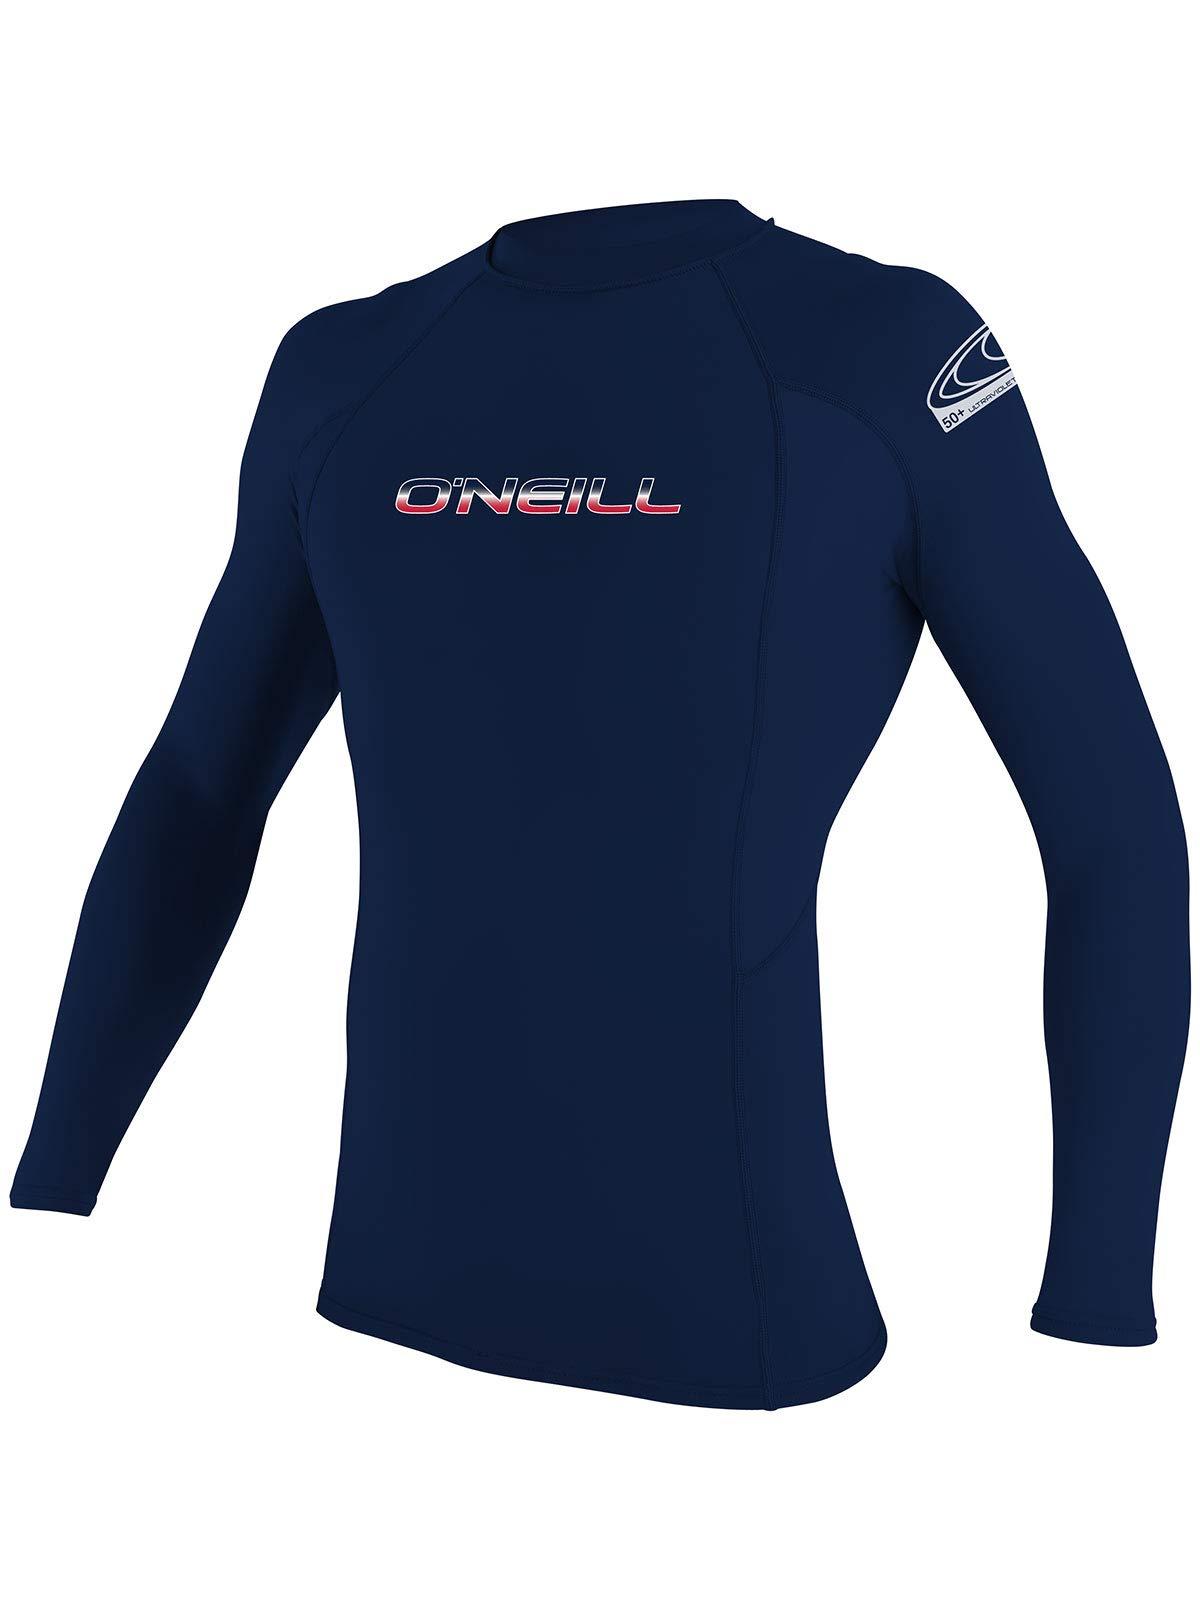 O'Neill Men's Basic Skins Long Sleeve Rashguard S Navy (3342IB)